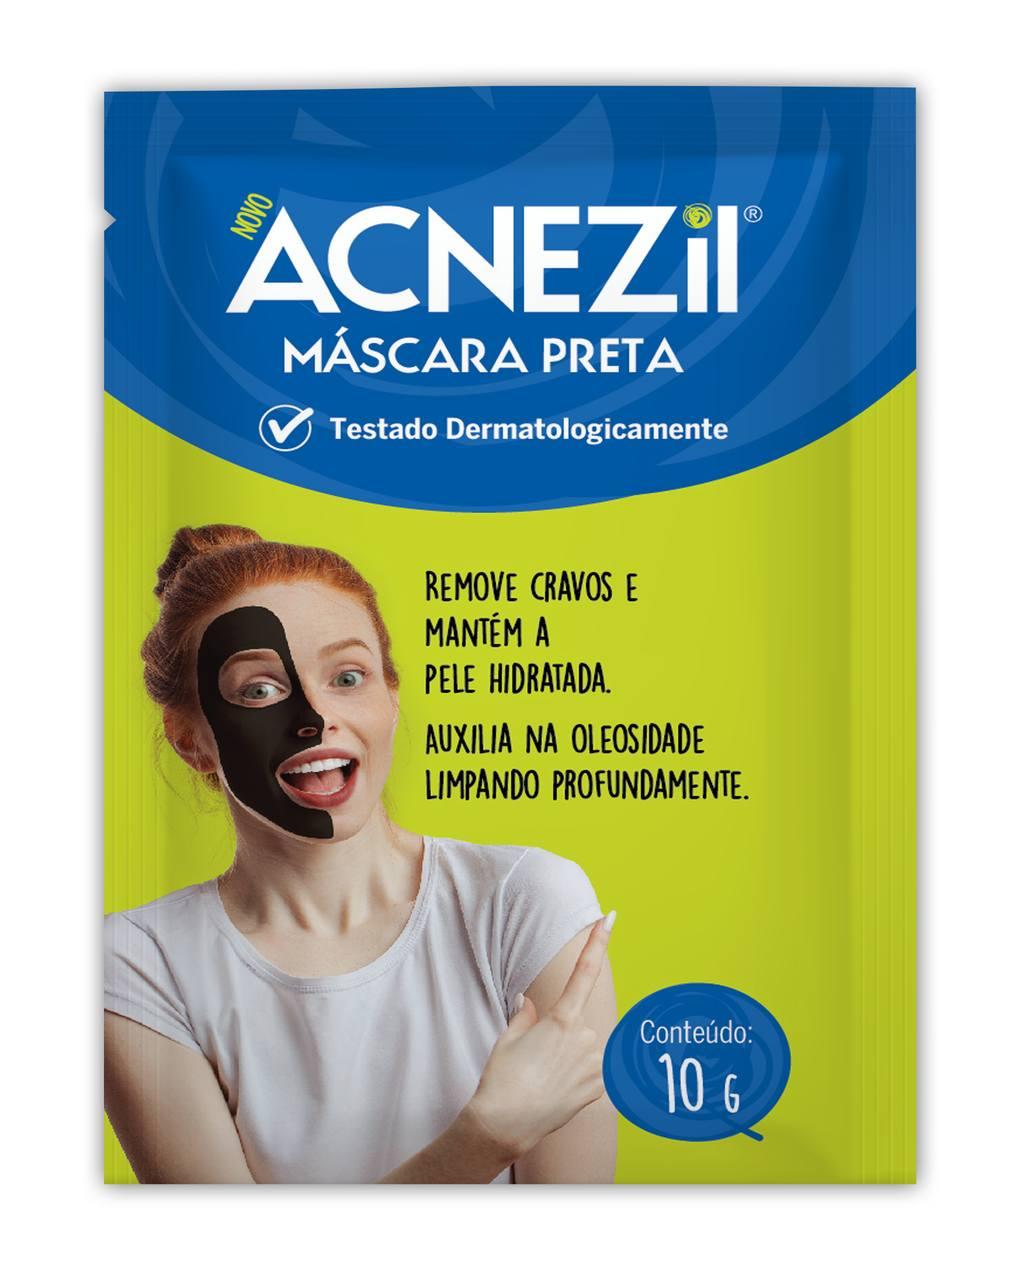 Imagem de embalagem de Acnezil Máscara para Cravos